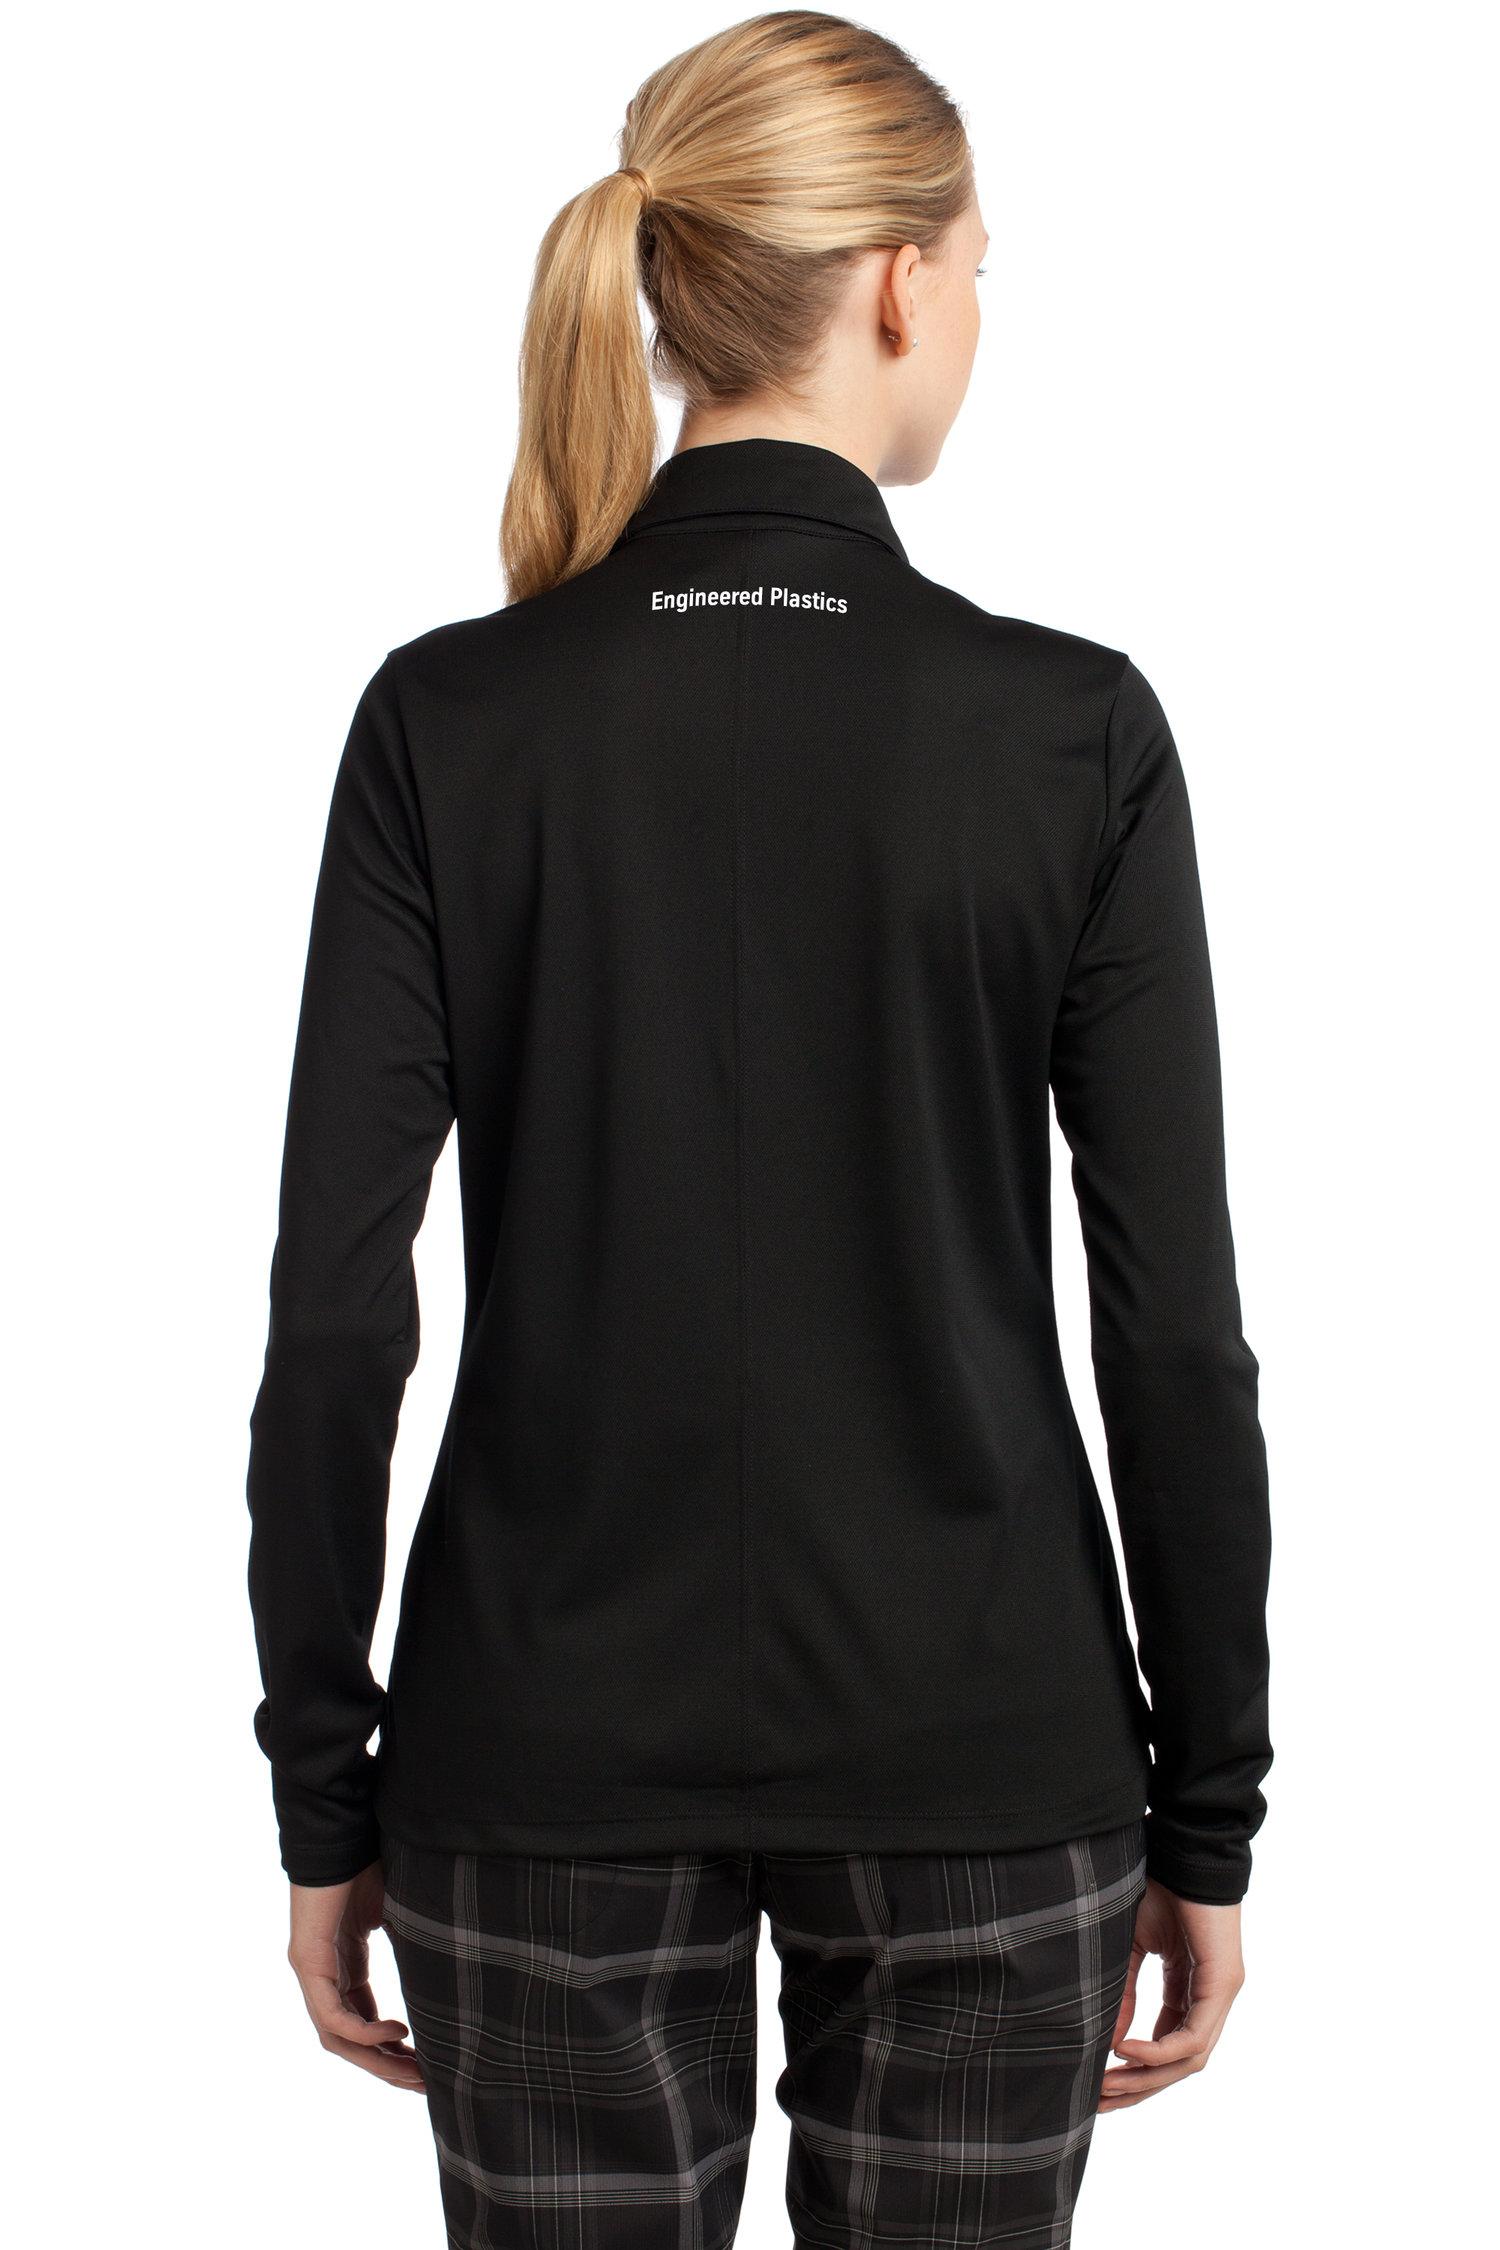 ddb16fbae15 Nike Golf Ladies Long Sleeve Dri-FIT Stretch Tech Polo  545322 ...